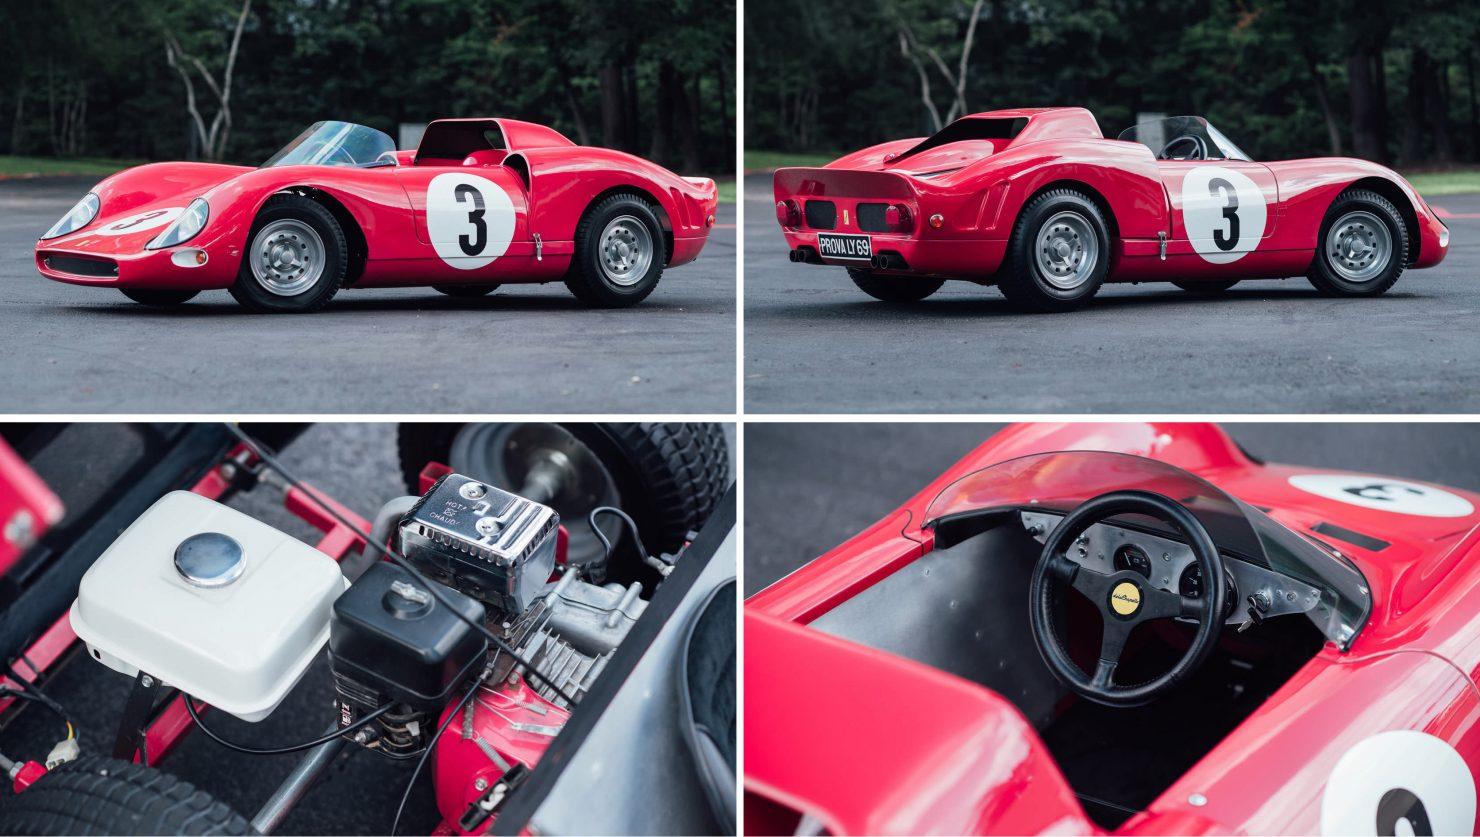 Ferrari Go Kart Collage 1480x837 - Classic Car Go Karts